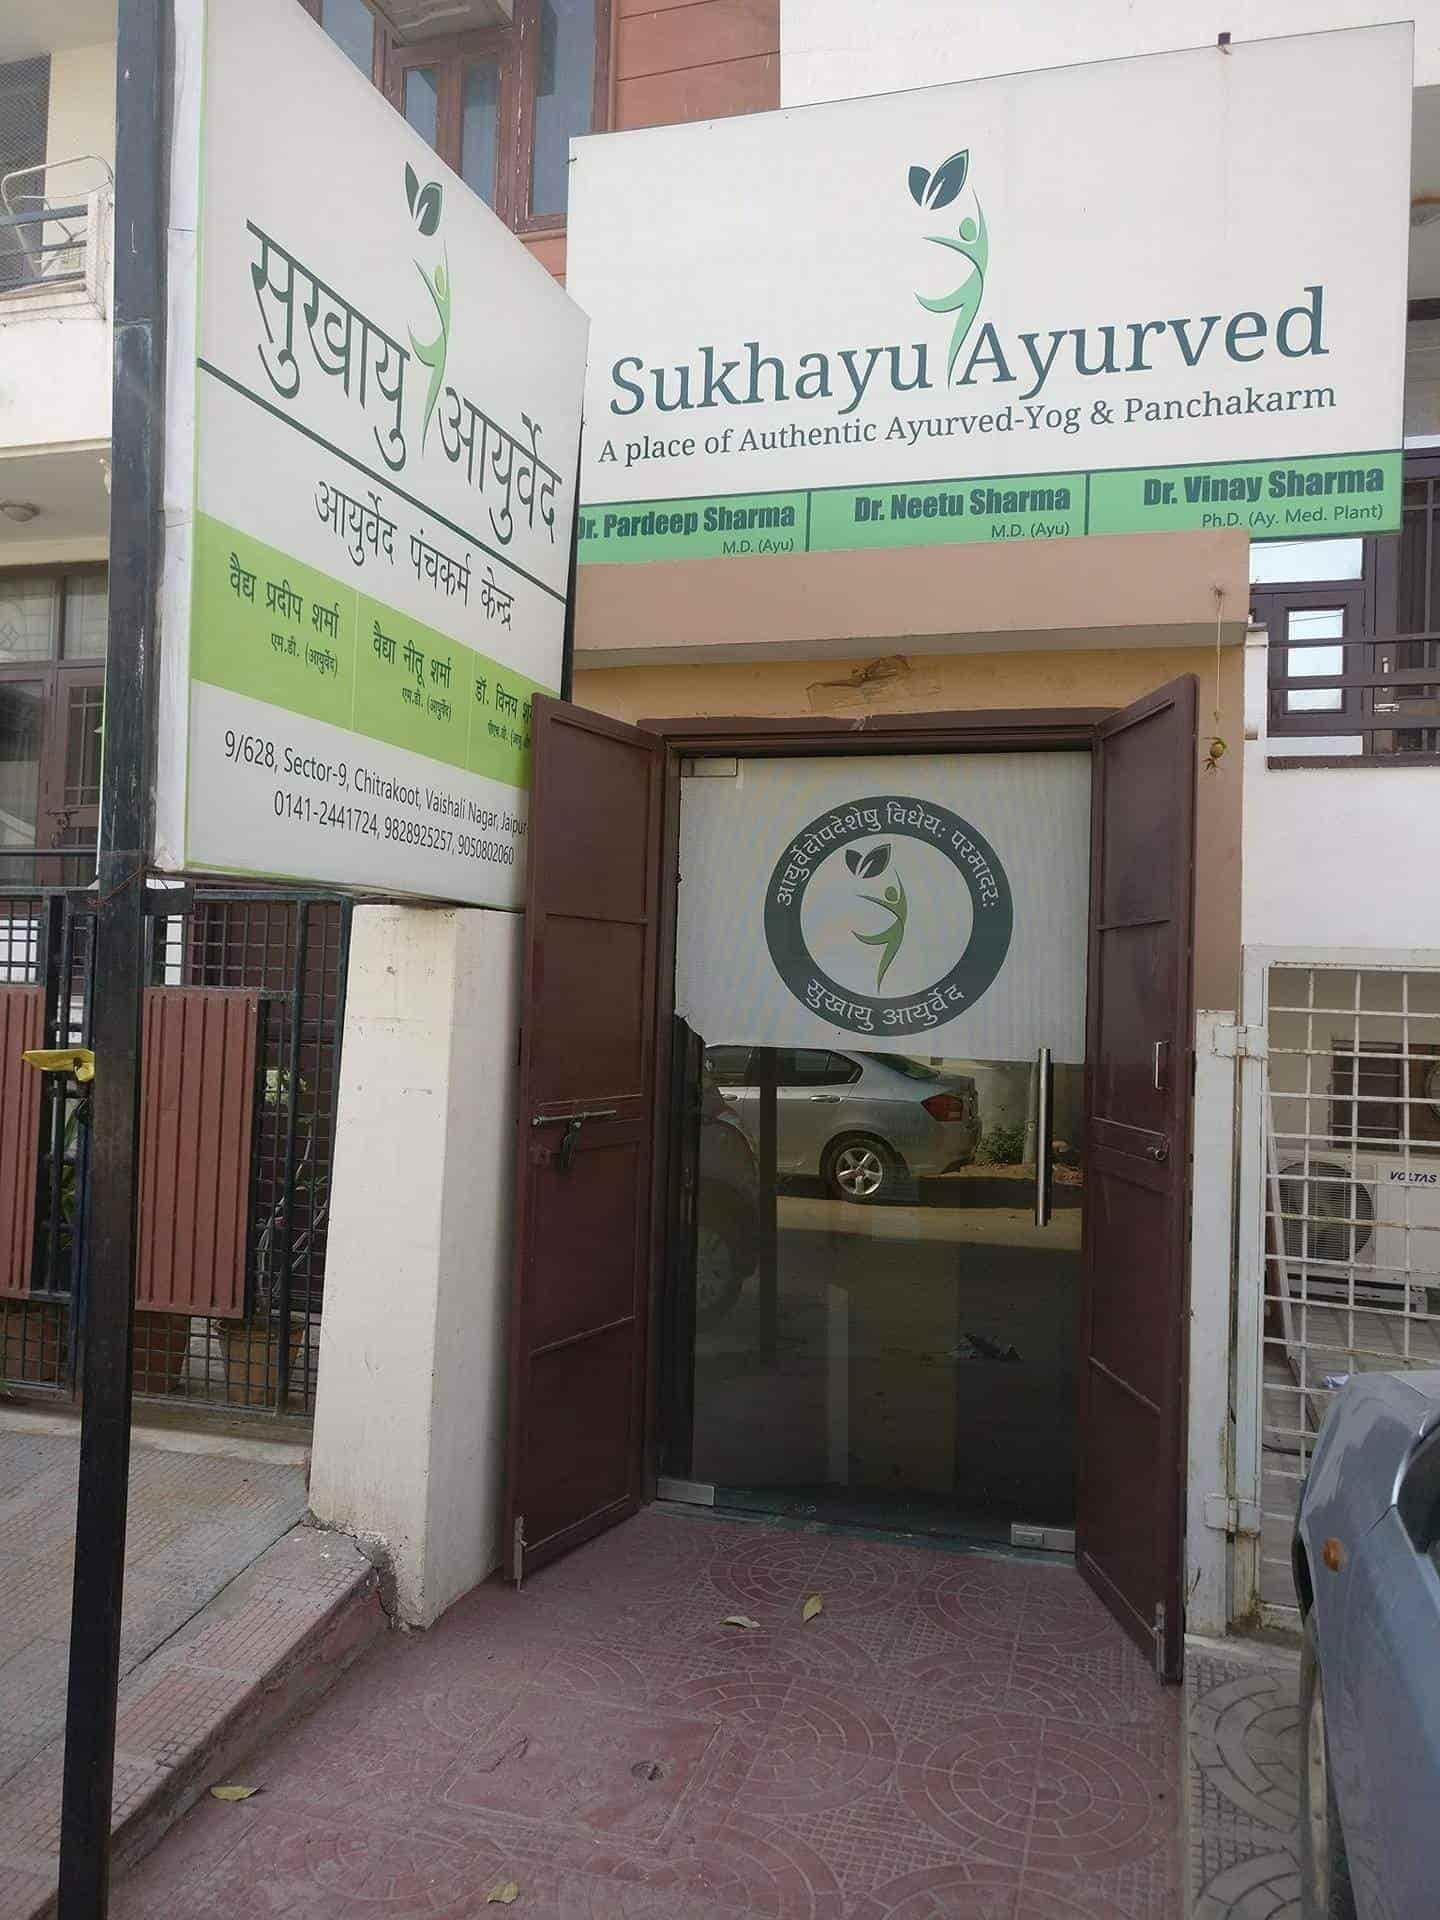 Image result for Sukhayu Ayurved, Jaipur, Rajasthan, India